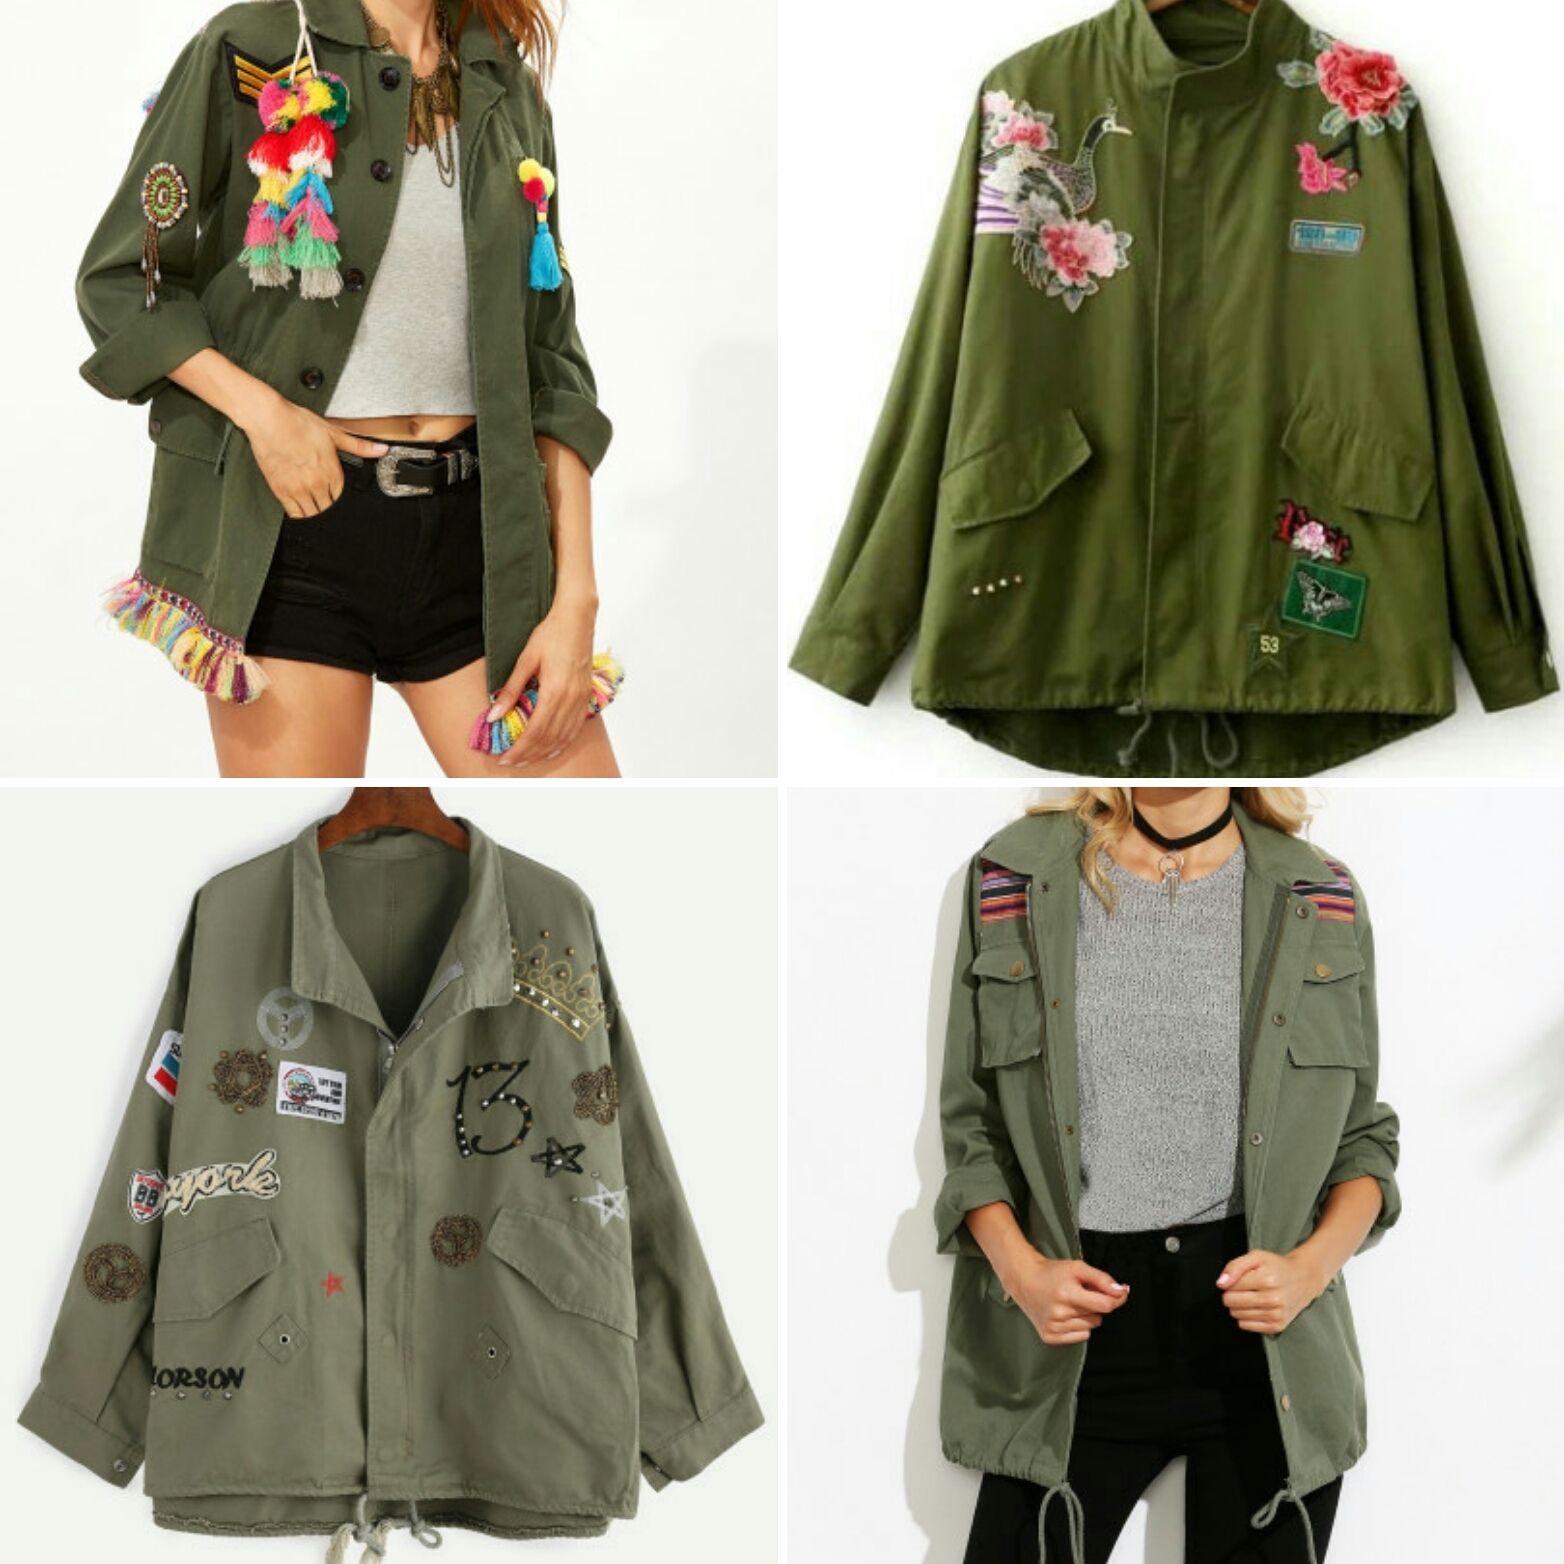 chaquetas Pinterest Military «moda» Shopping Chic Militares Faw1Hq